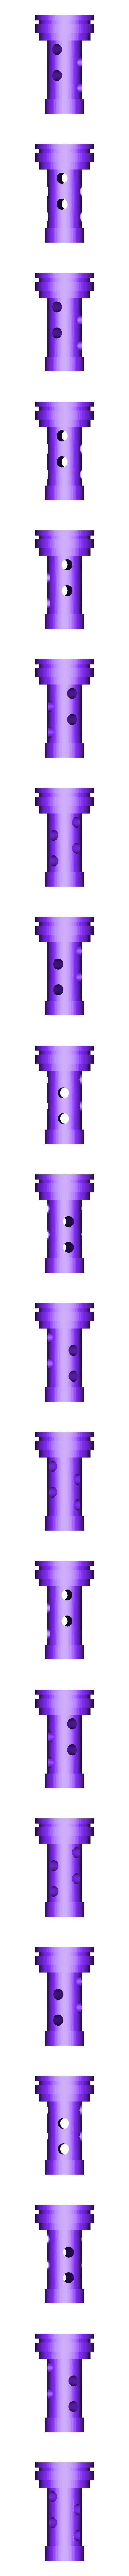 STL_S5_v20_Bottom_Barrel_Tip_.stl Download free STL file Star Wars Naboo S5 Heavy Blaster Pistol • 3D printing design, Dsk